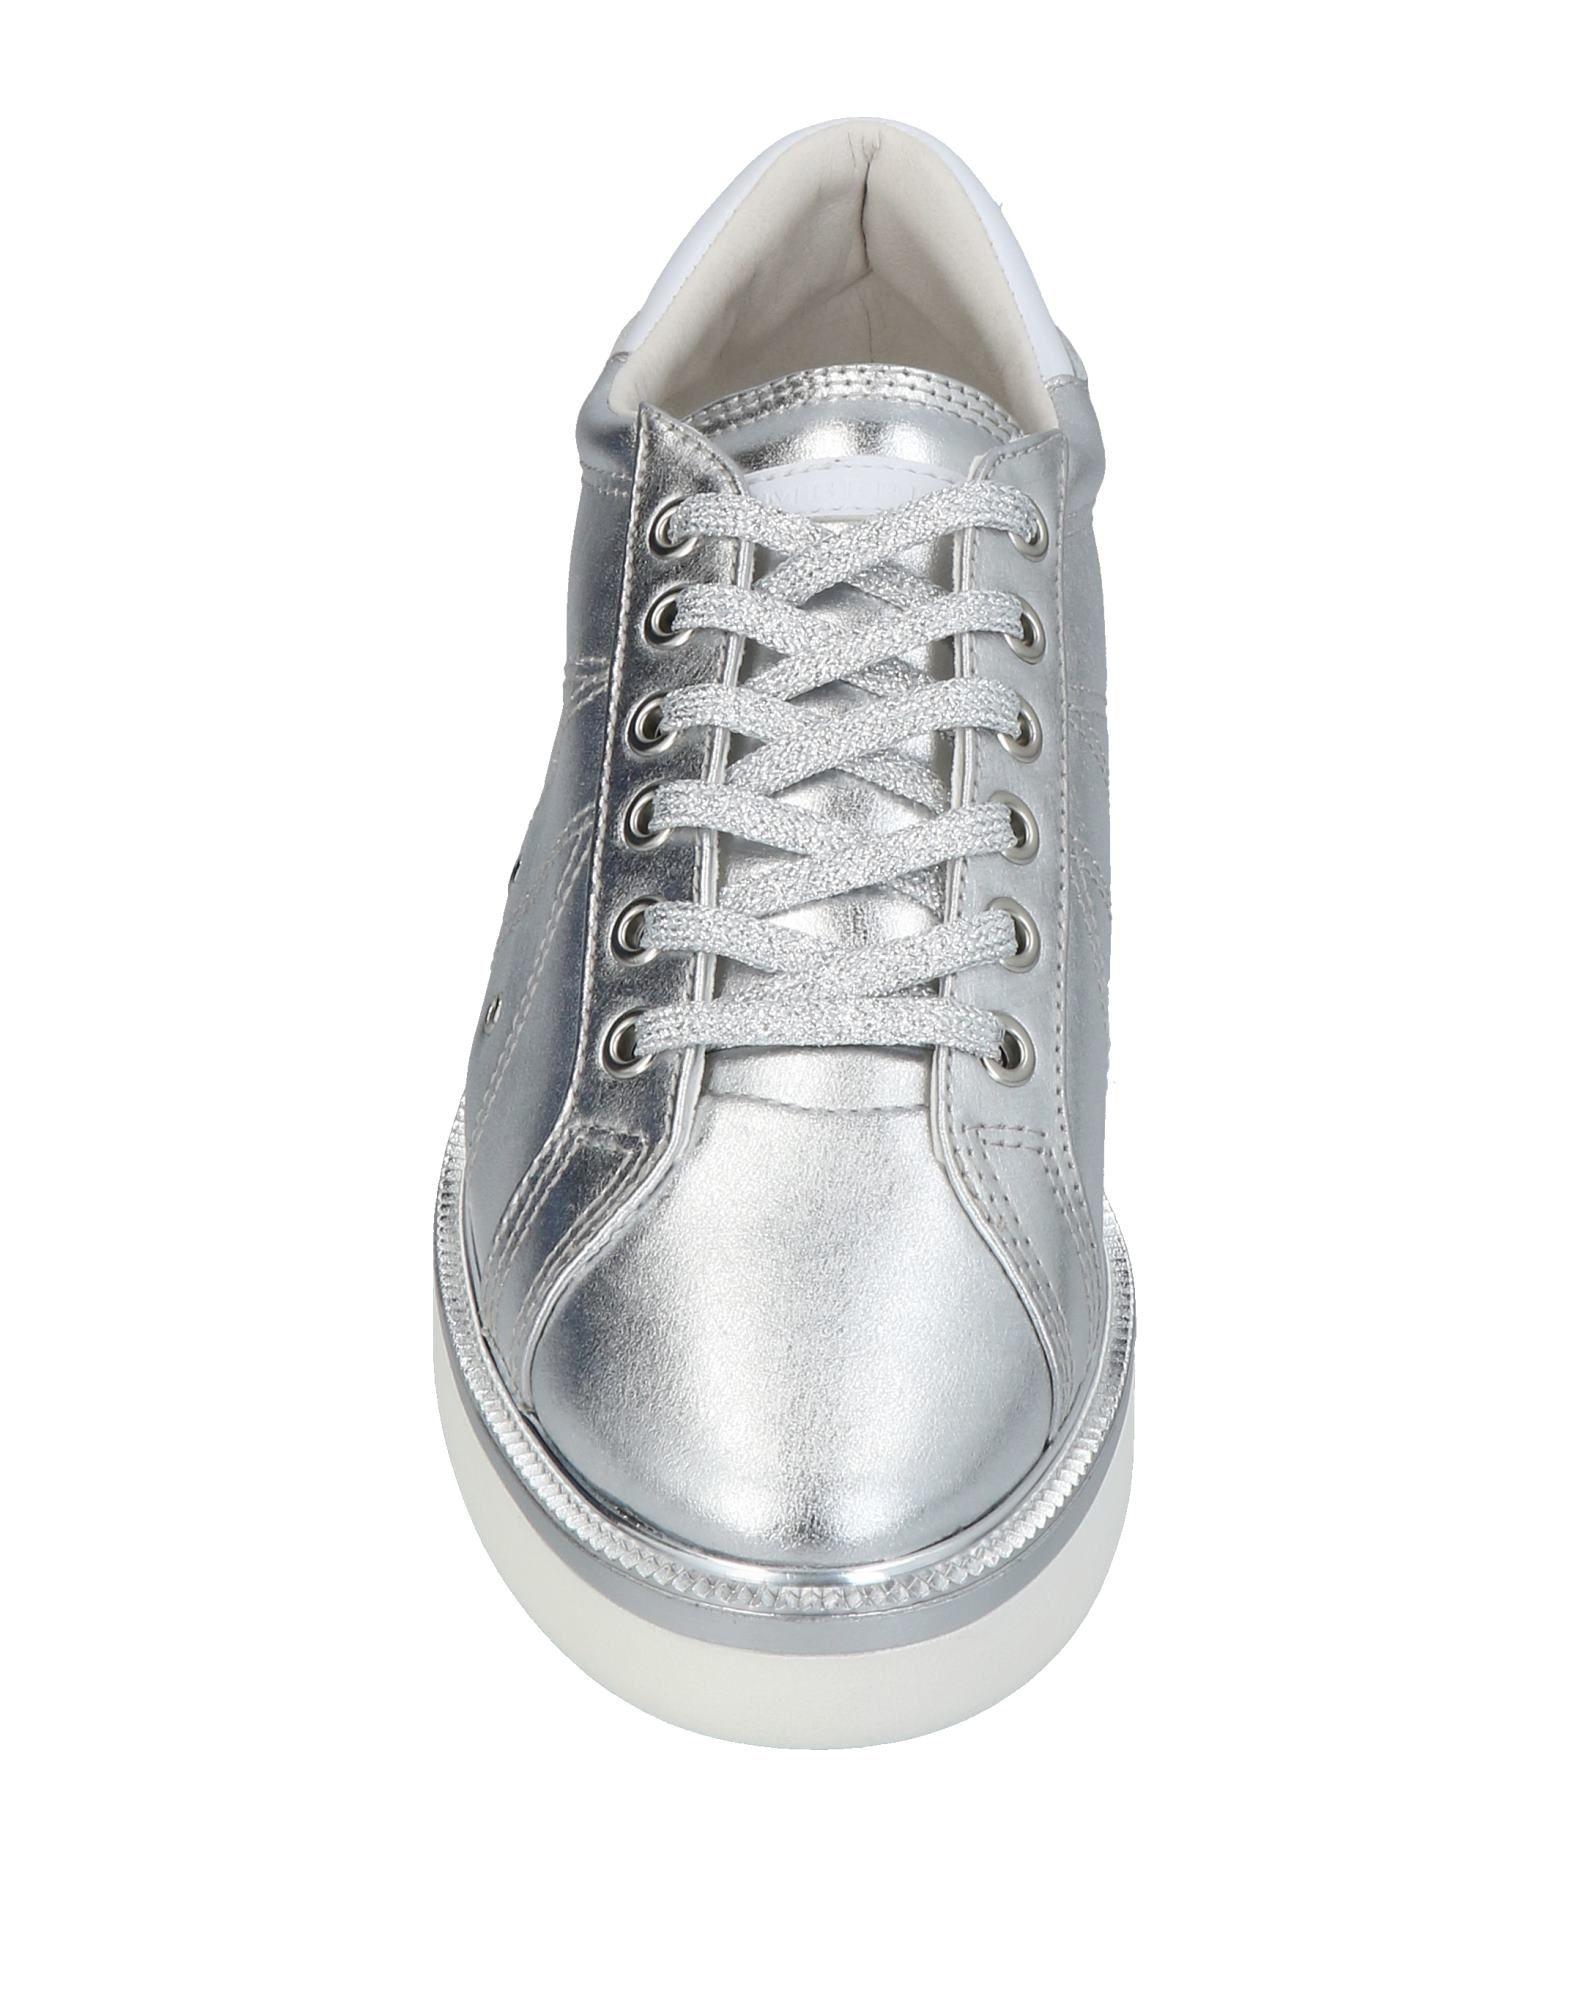 11441546NB Lumberjack Sneakers Damen  11441546NB  f837ab